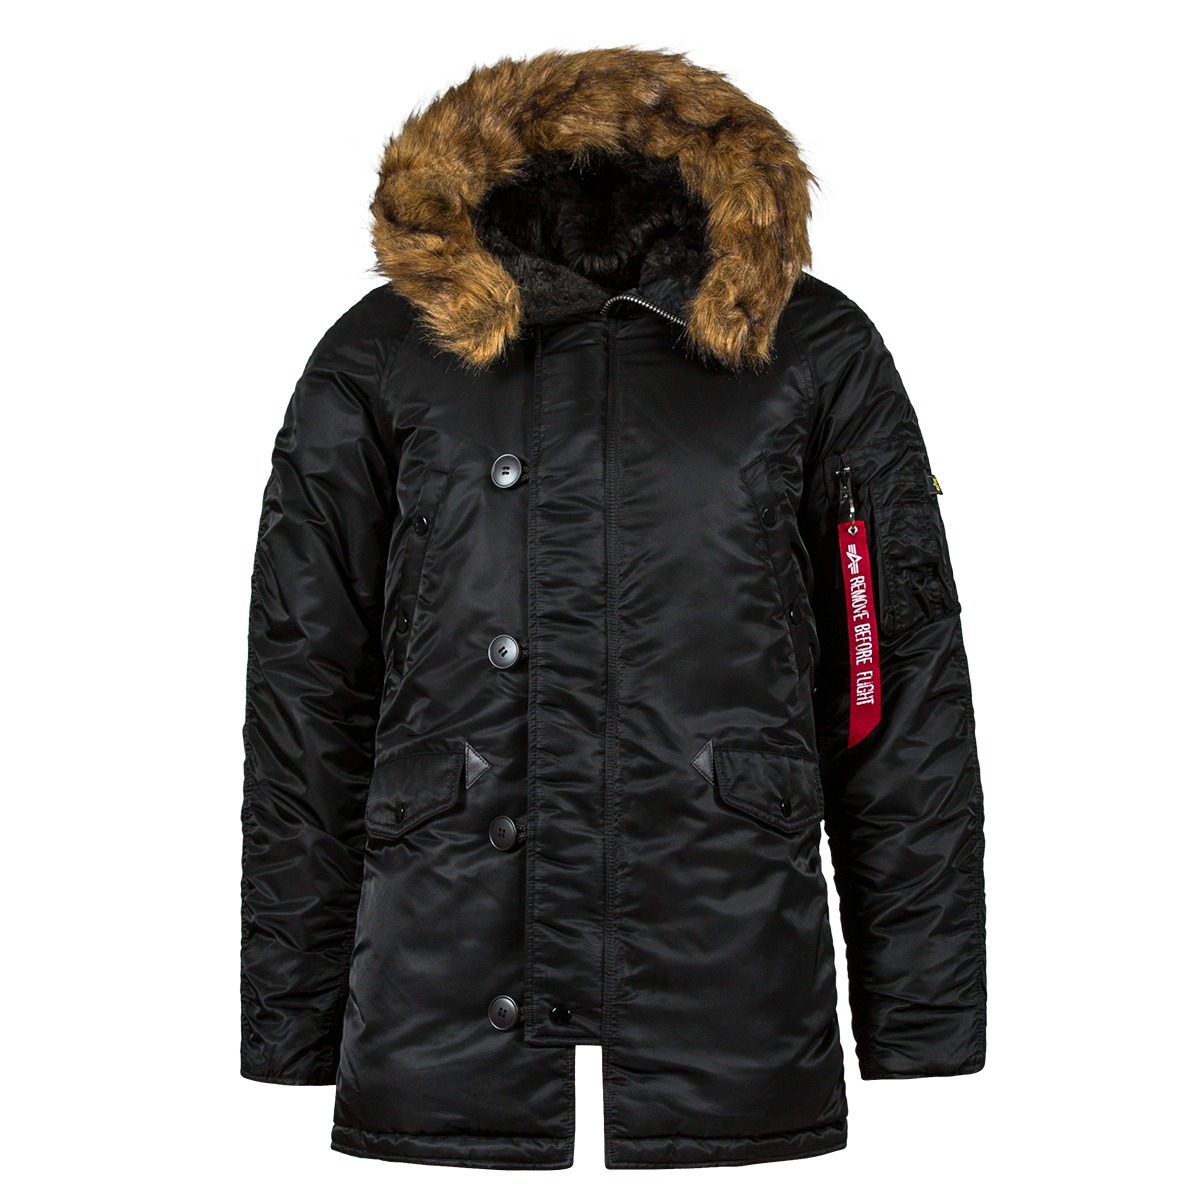 f95fda24 Куртка Аляска N-3B Slim Fit Черная (оранжевая подкладка)